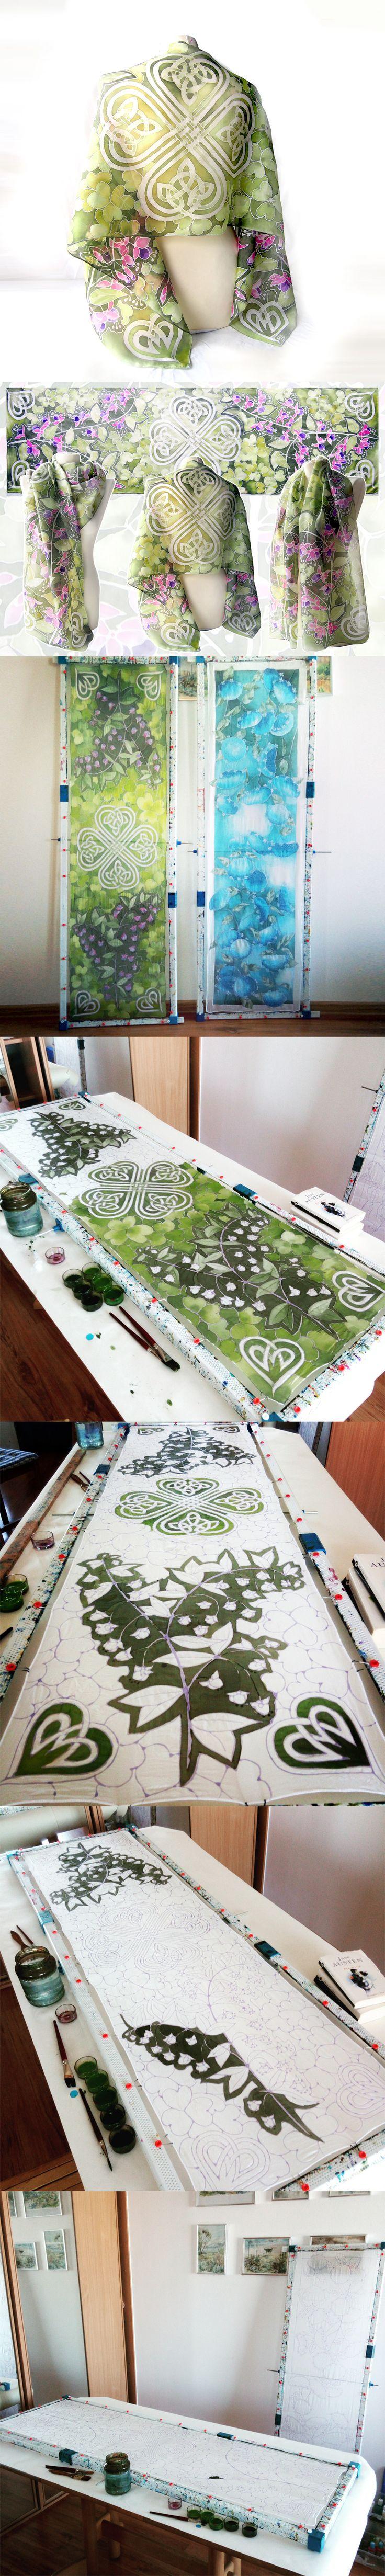 Silk #scarf #shamrock #handpainted by Luiza #malinowska #minkulul #celtic #celticknot design on #green #scarves